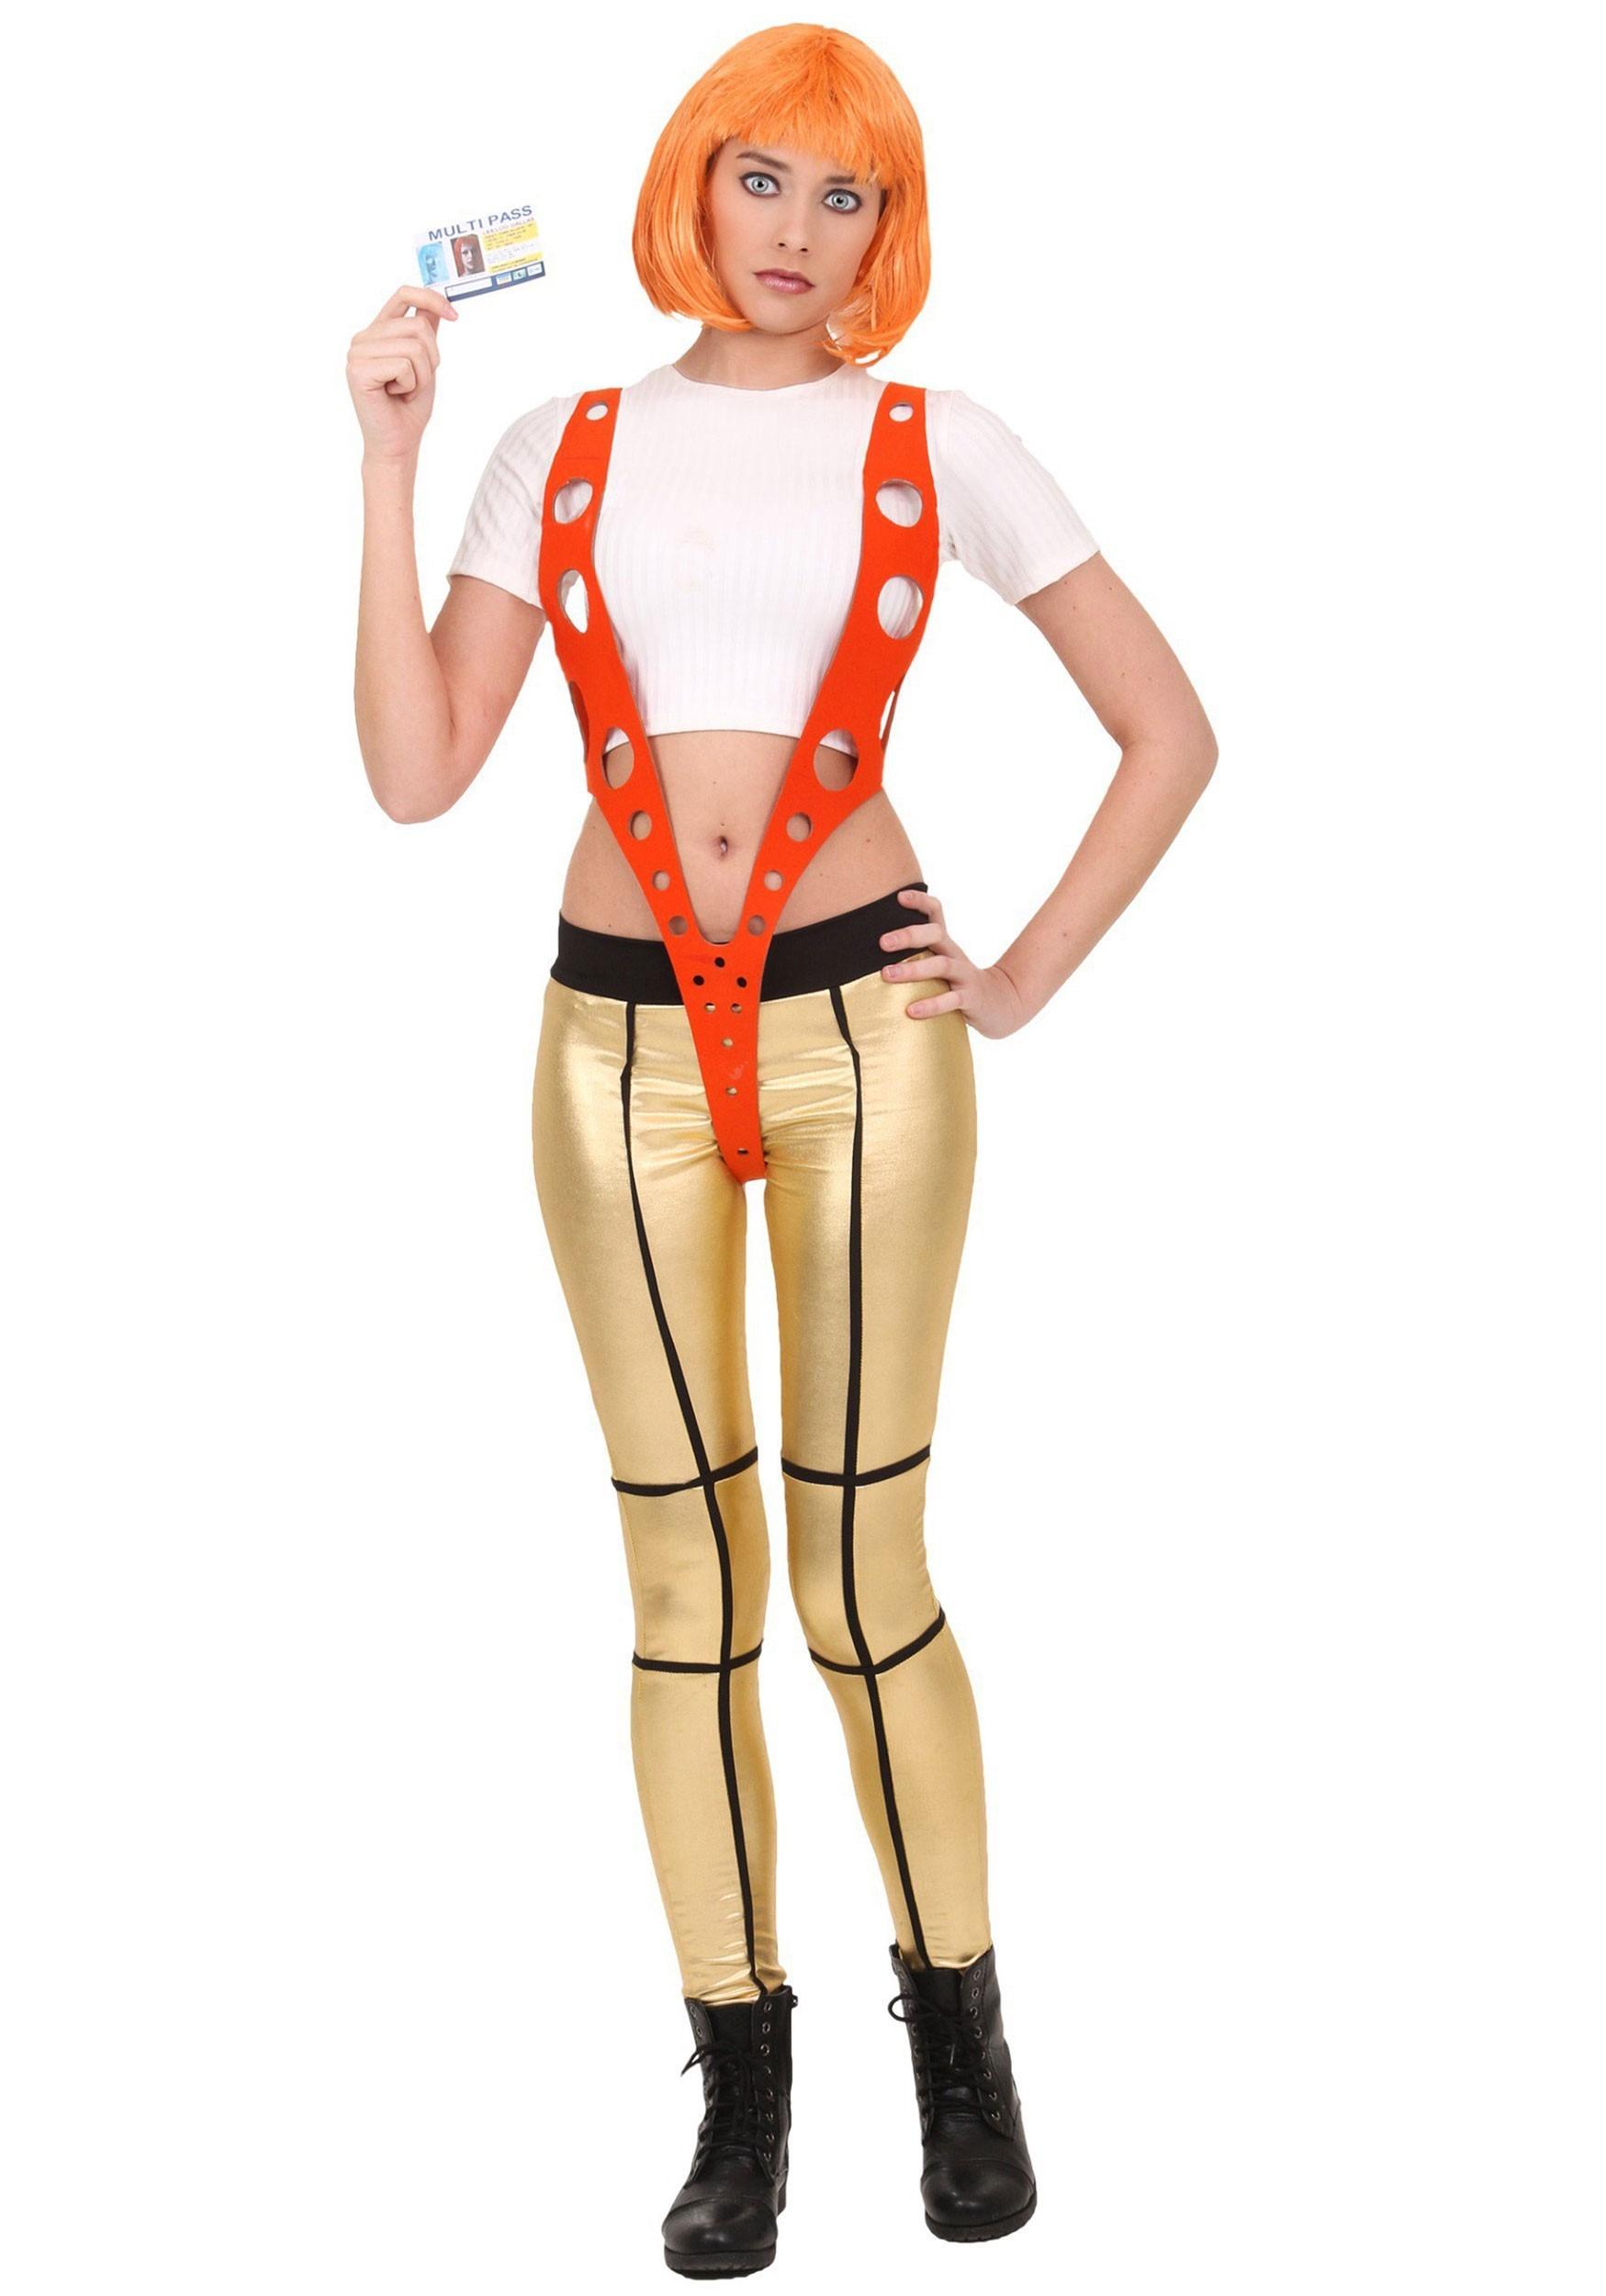 5th Element Leeloo Orange Harness Costume   Exclusive